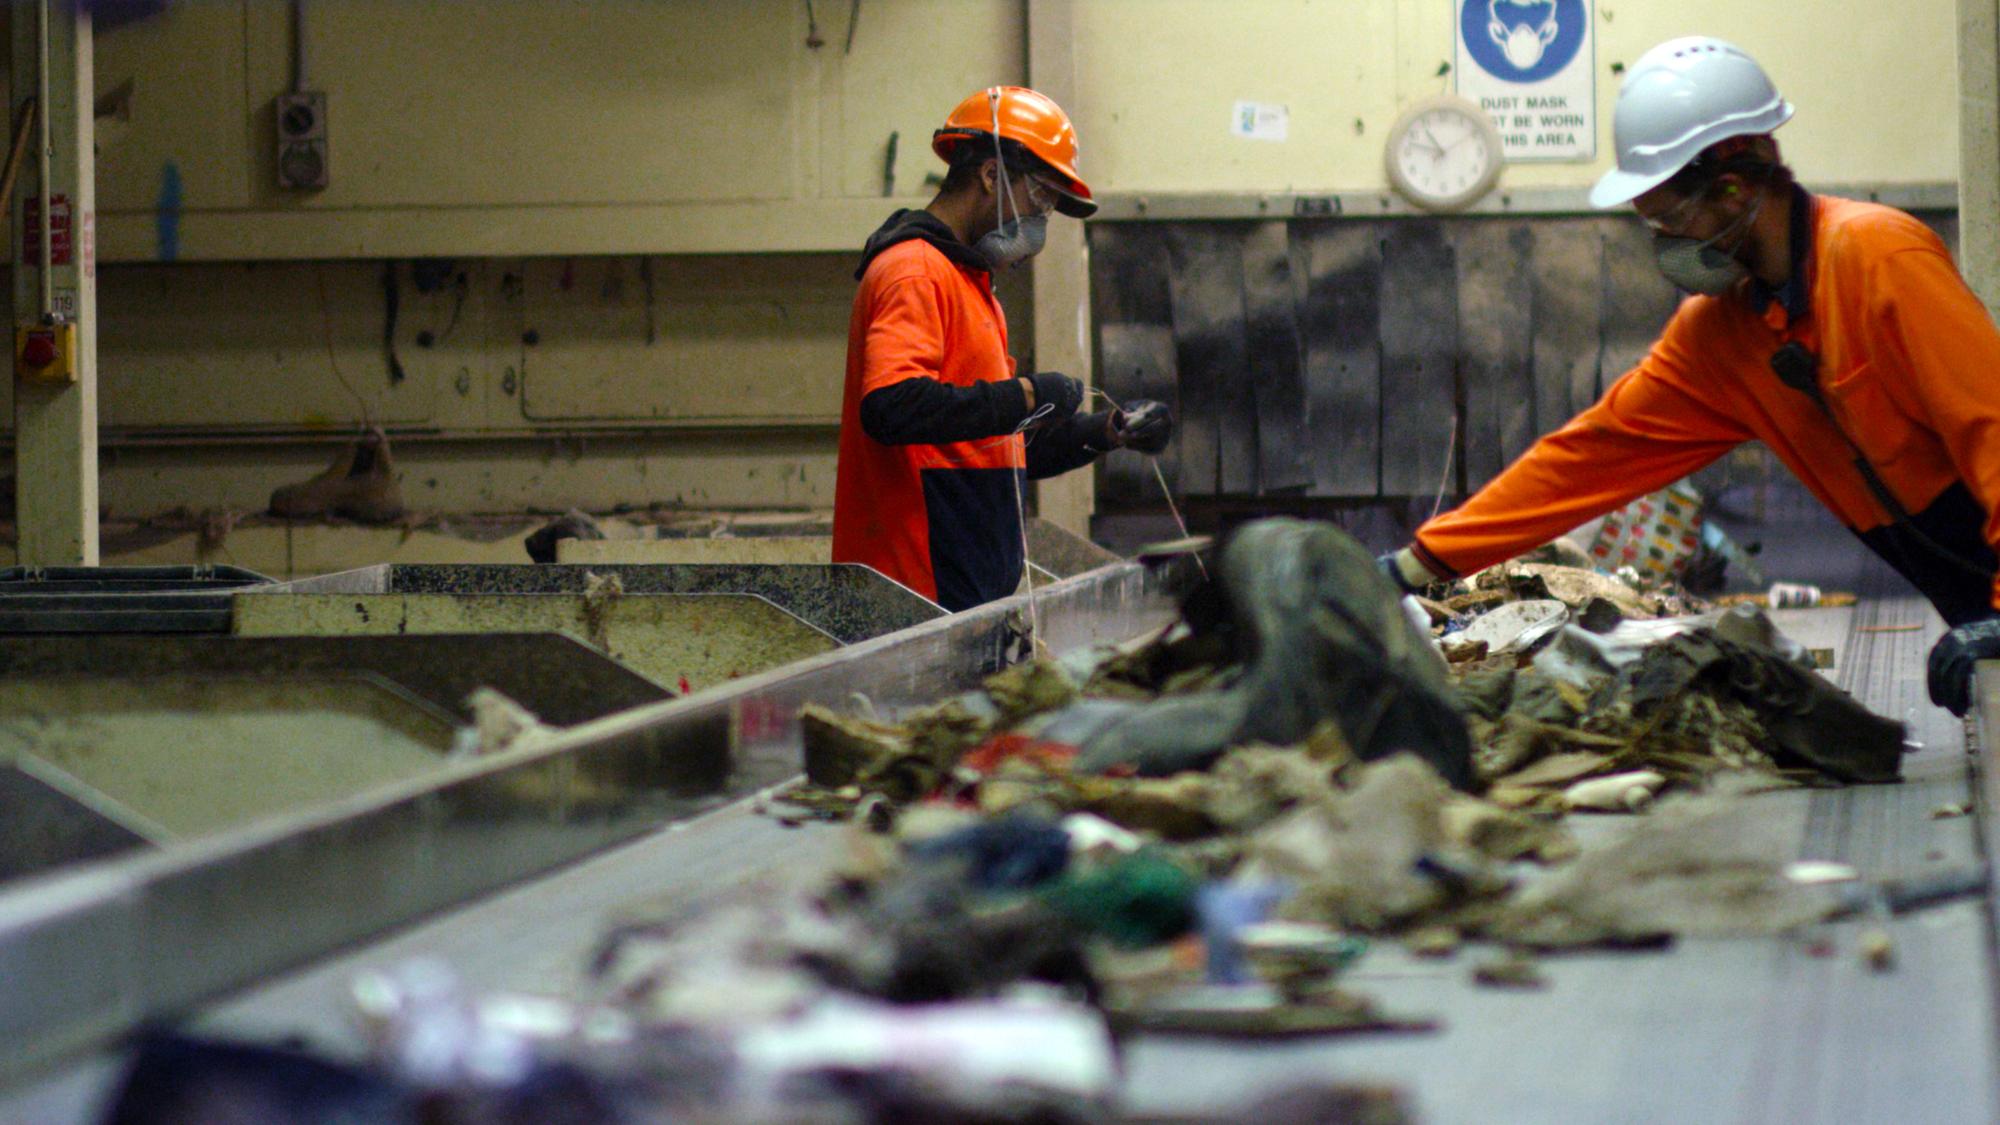 SUEZ ResourceCo header image. Two employees sorting through waste on conveyor.